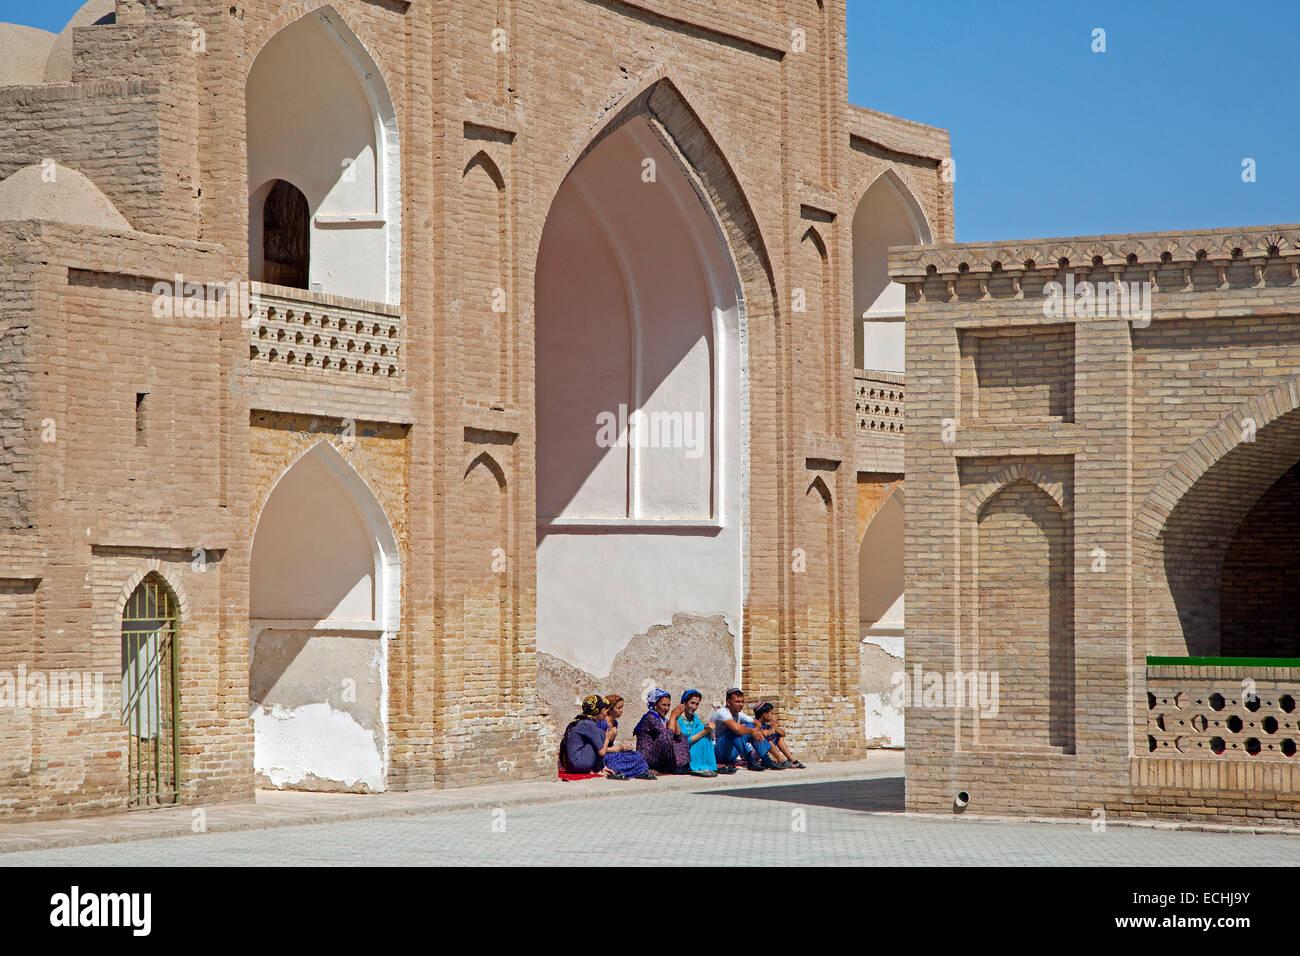 Mausoleum of Hoja Yusuf Hamadani in the ancient historic city of Merv / Merw near Mary, Turkmenistan - Stock Image